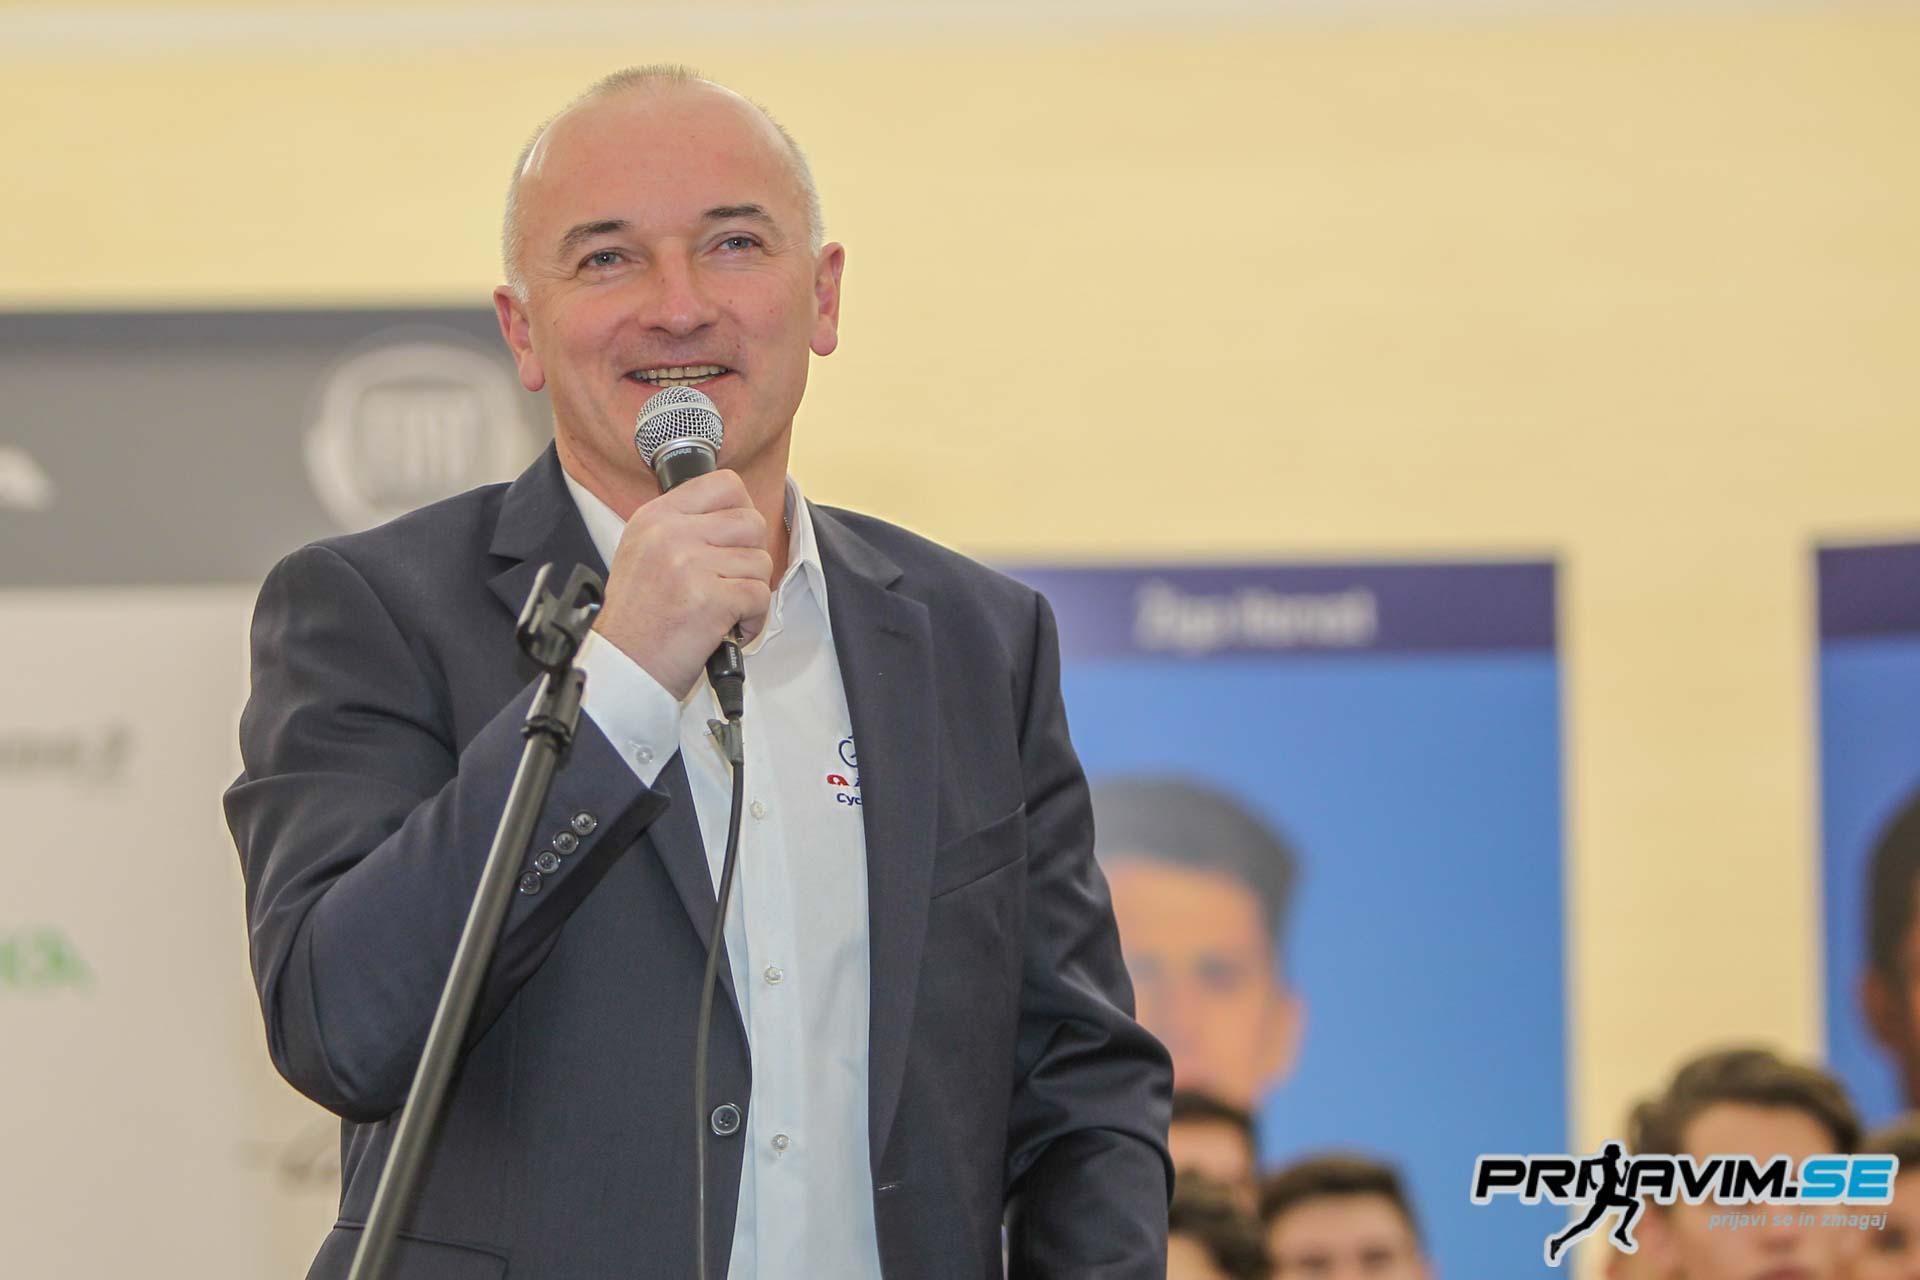 Bogdan Fink